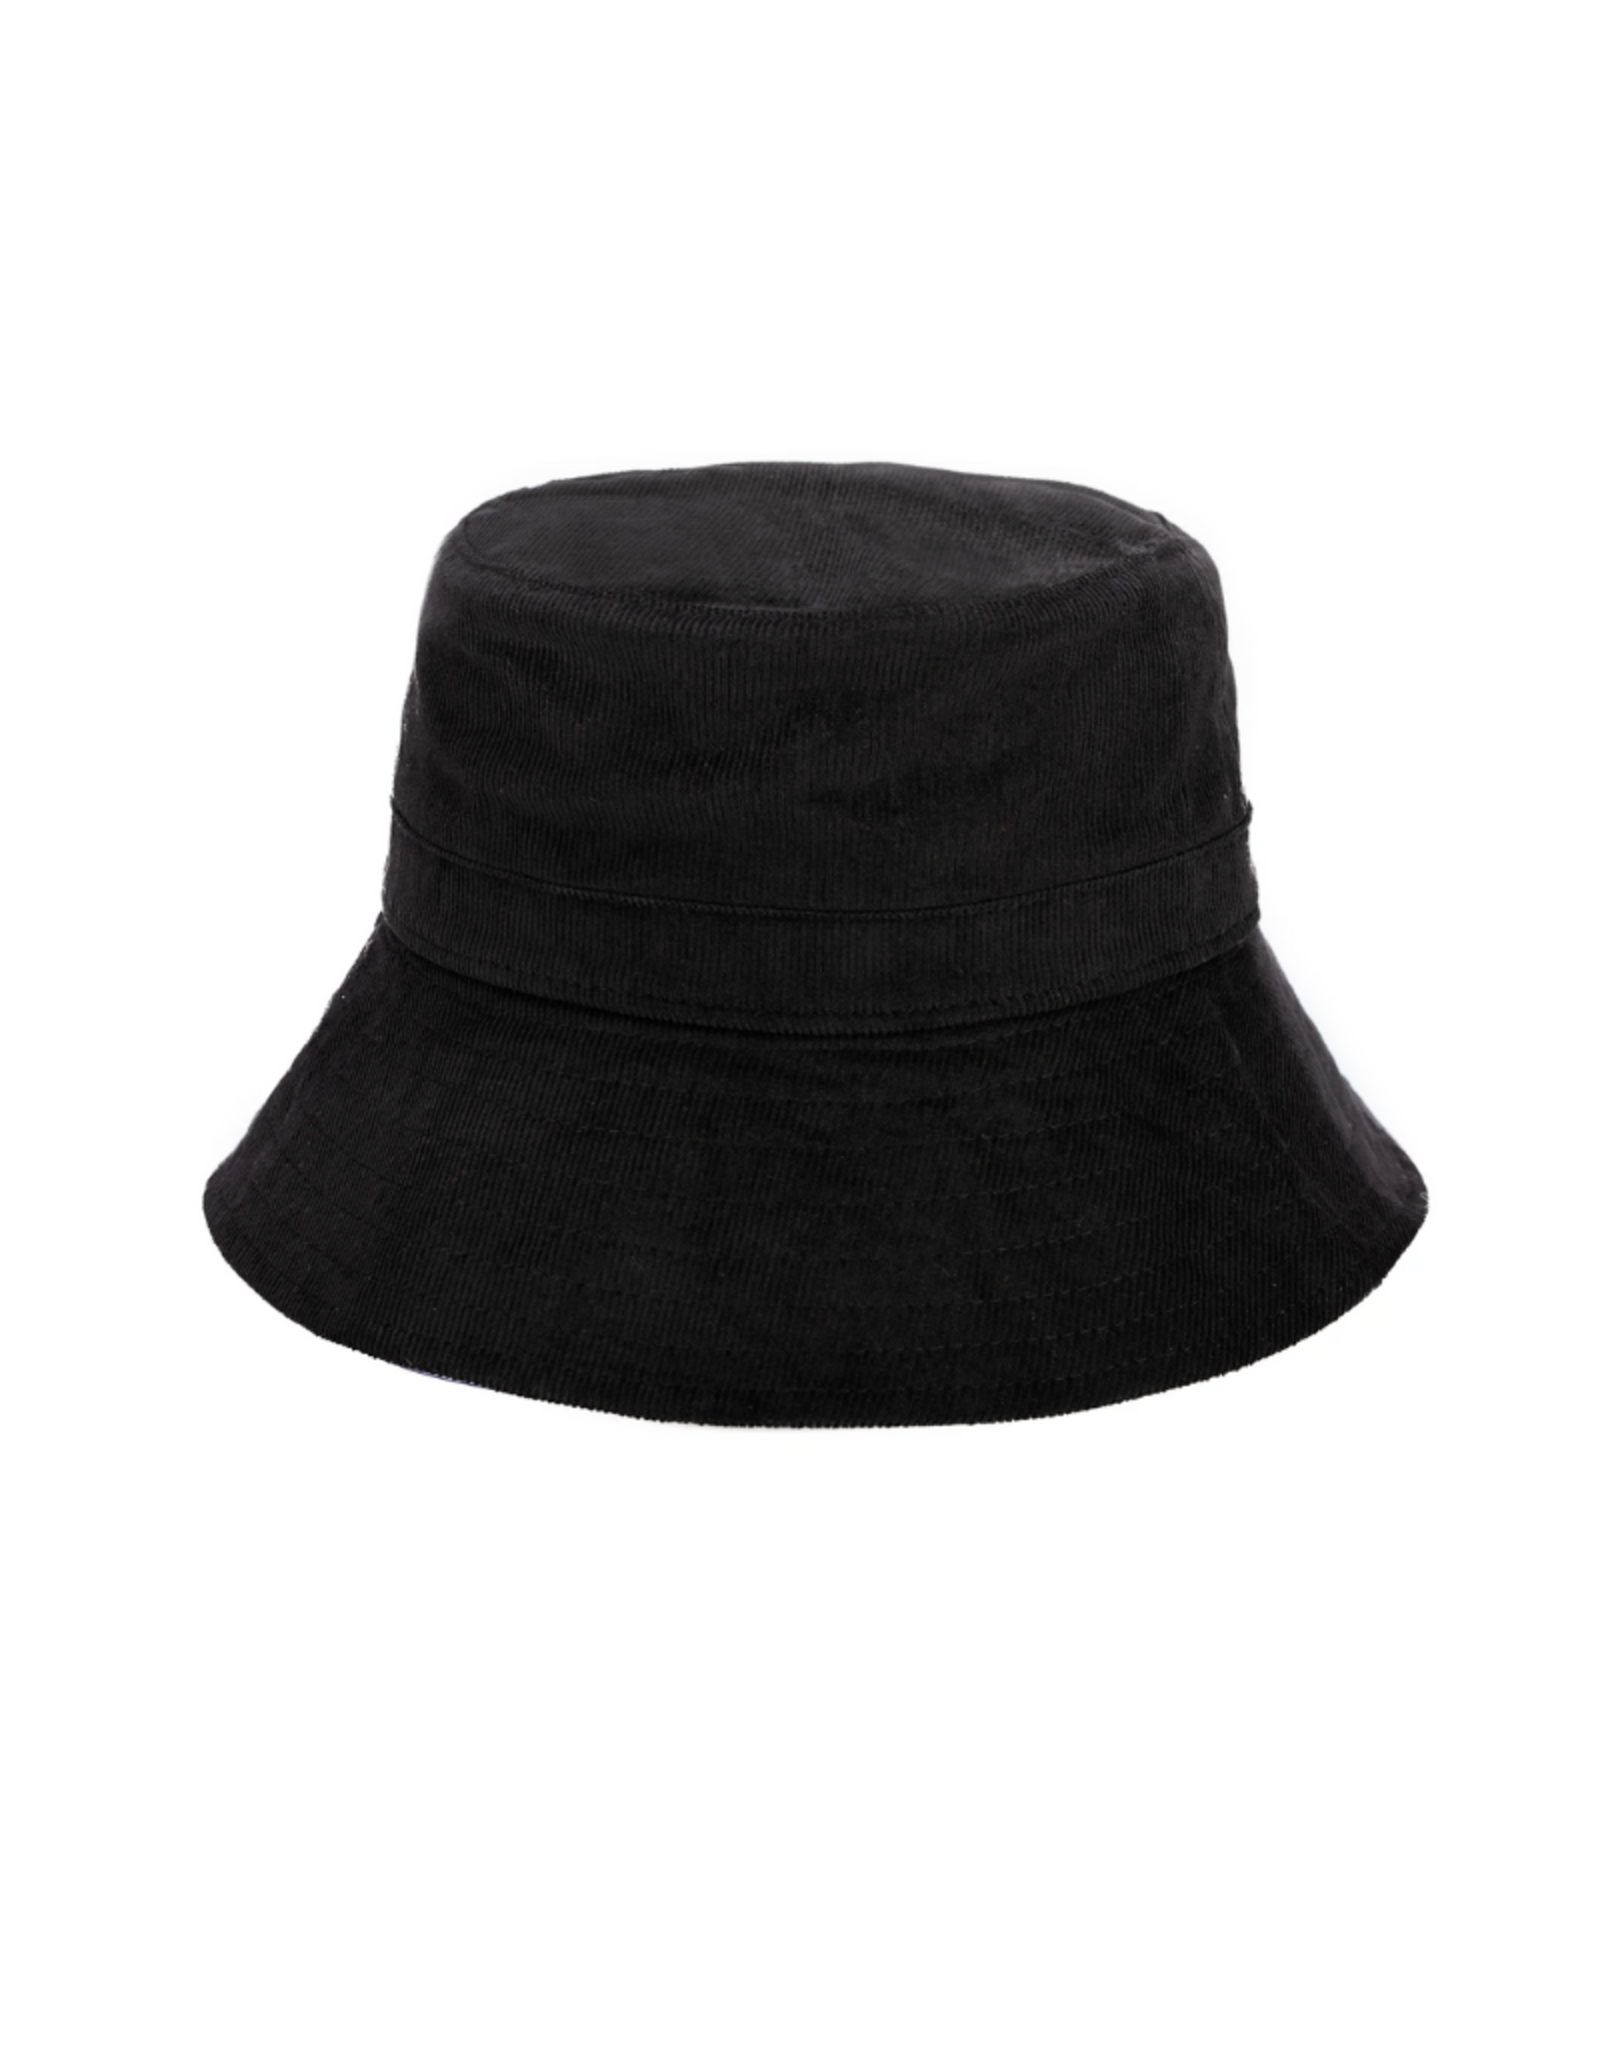 HAT-BUCKET-MAIN STREET- CORDUROY BLACK